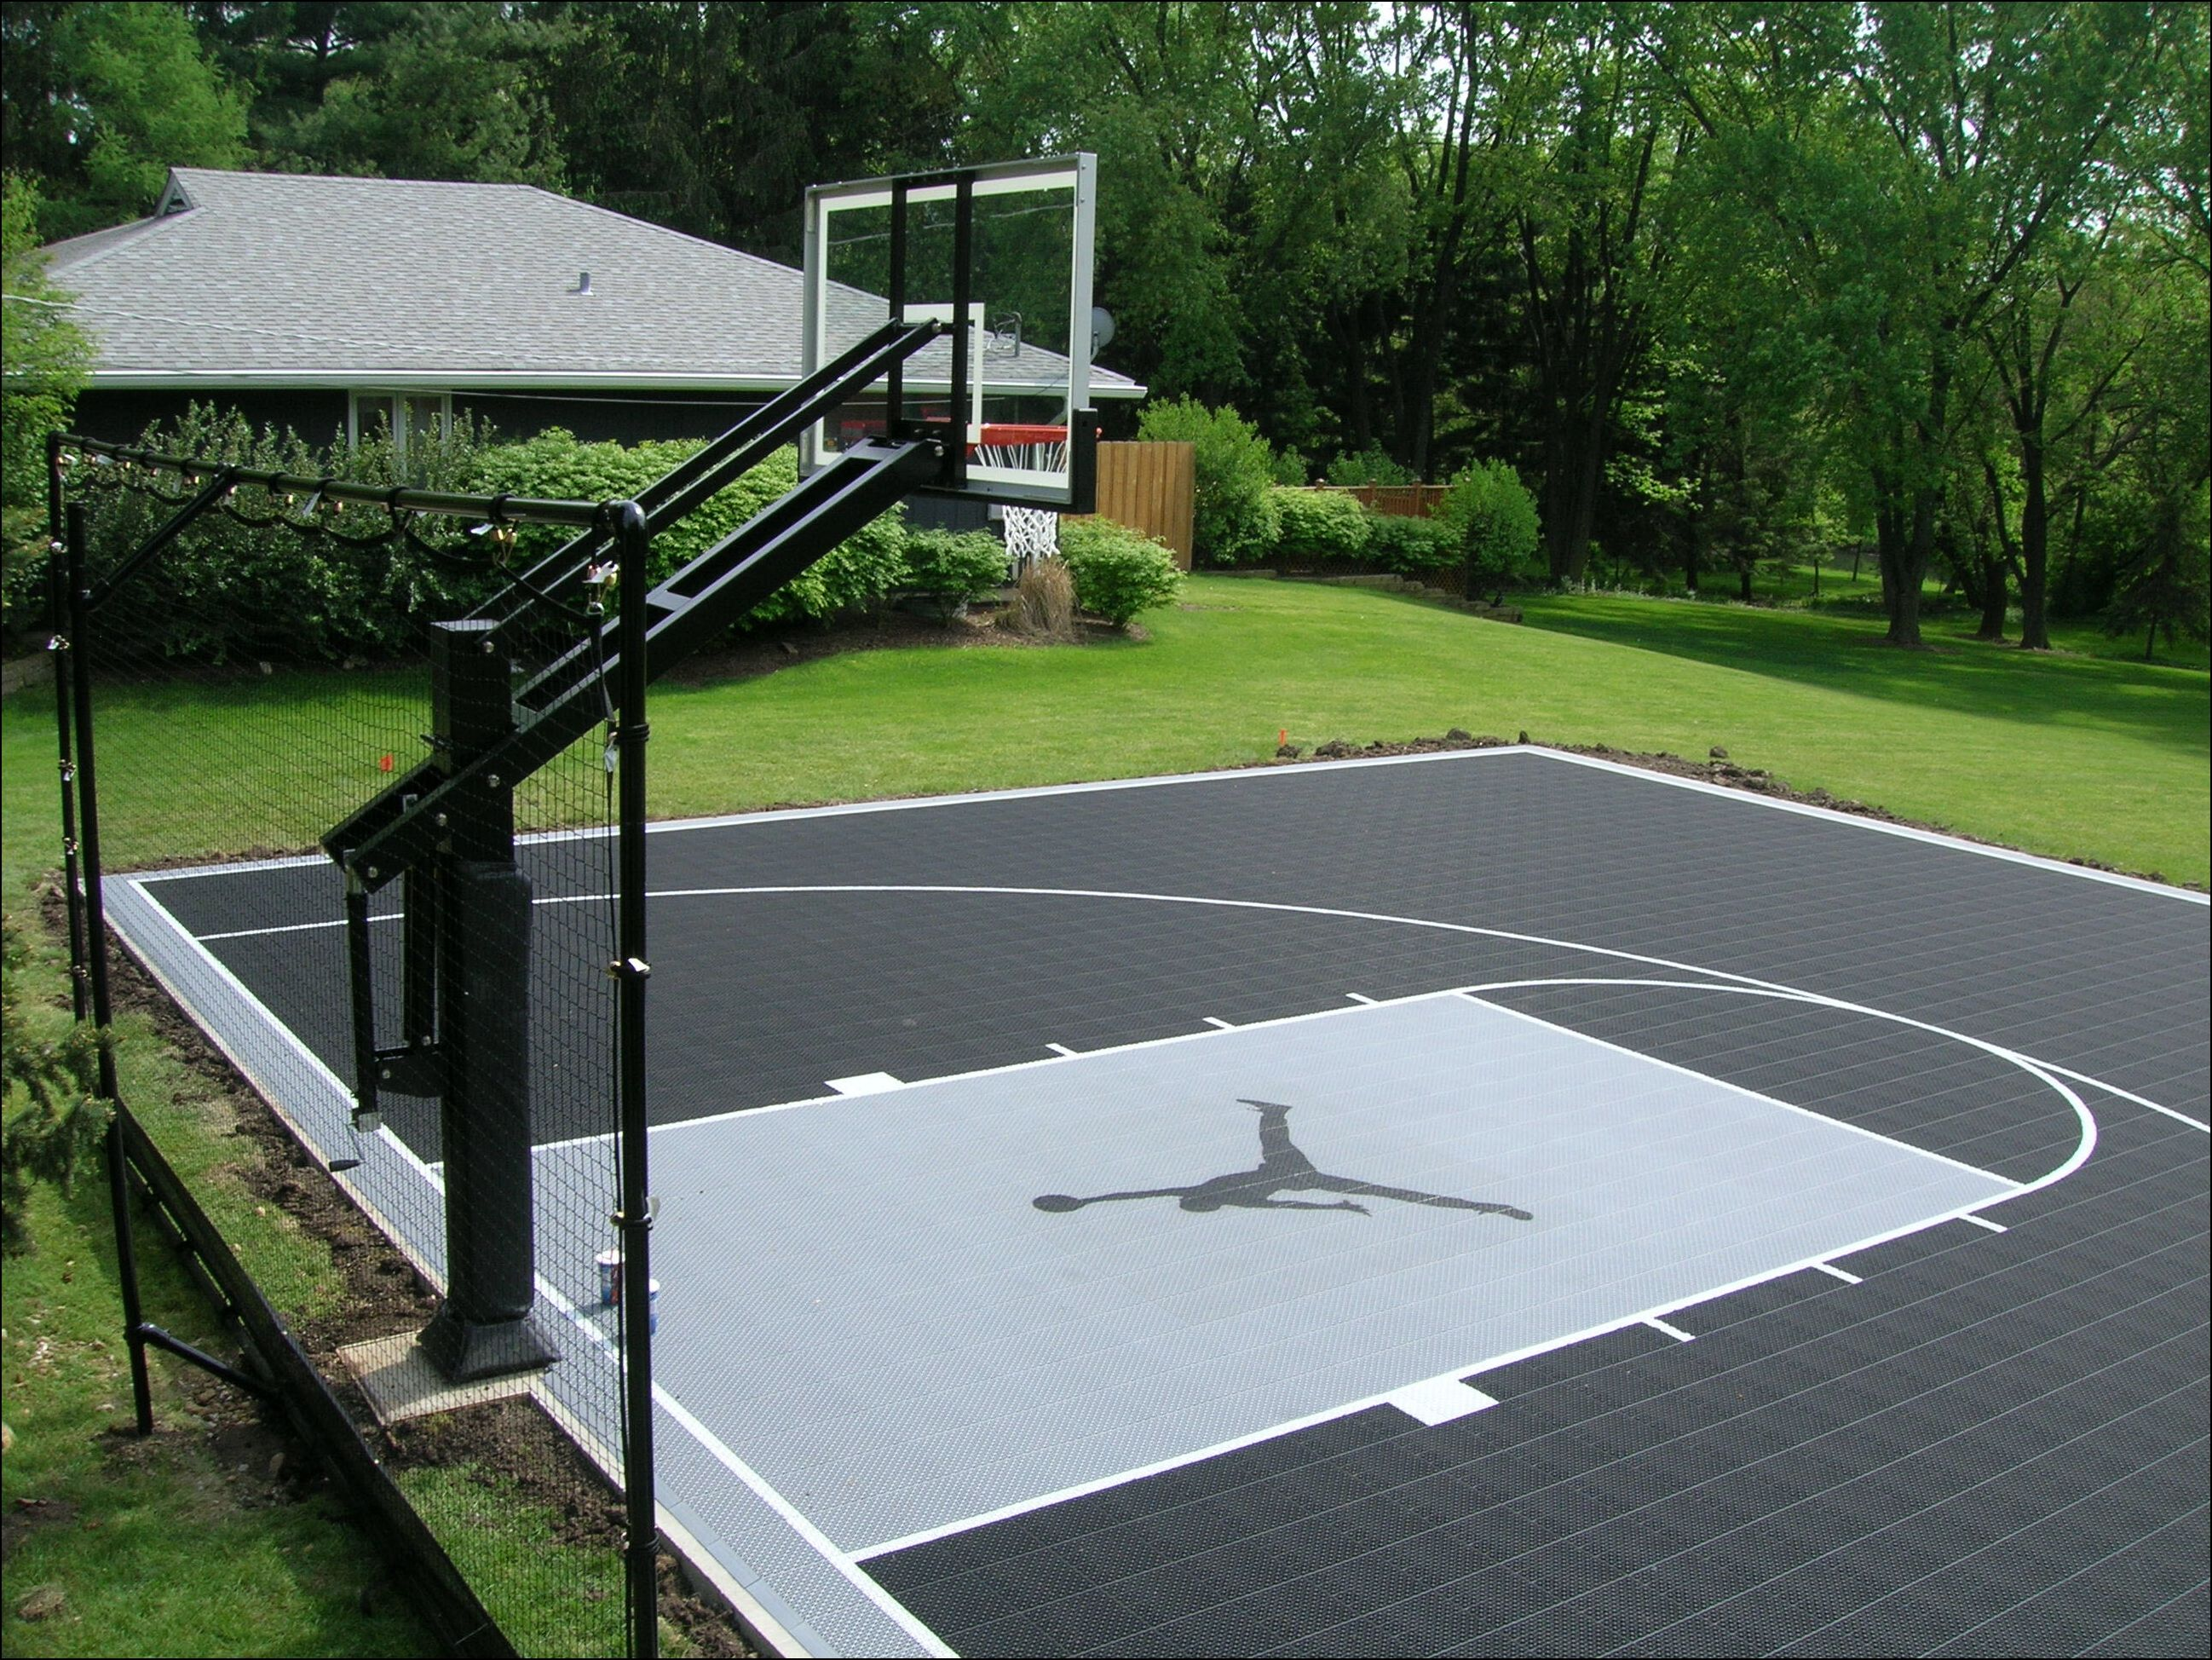 Genial Architecture Wonderful Basketball Court Designs For Modern Beautiful Home  Basketball Court Design